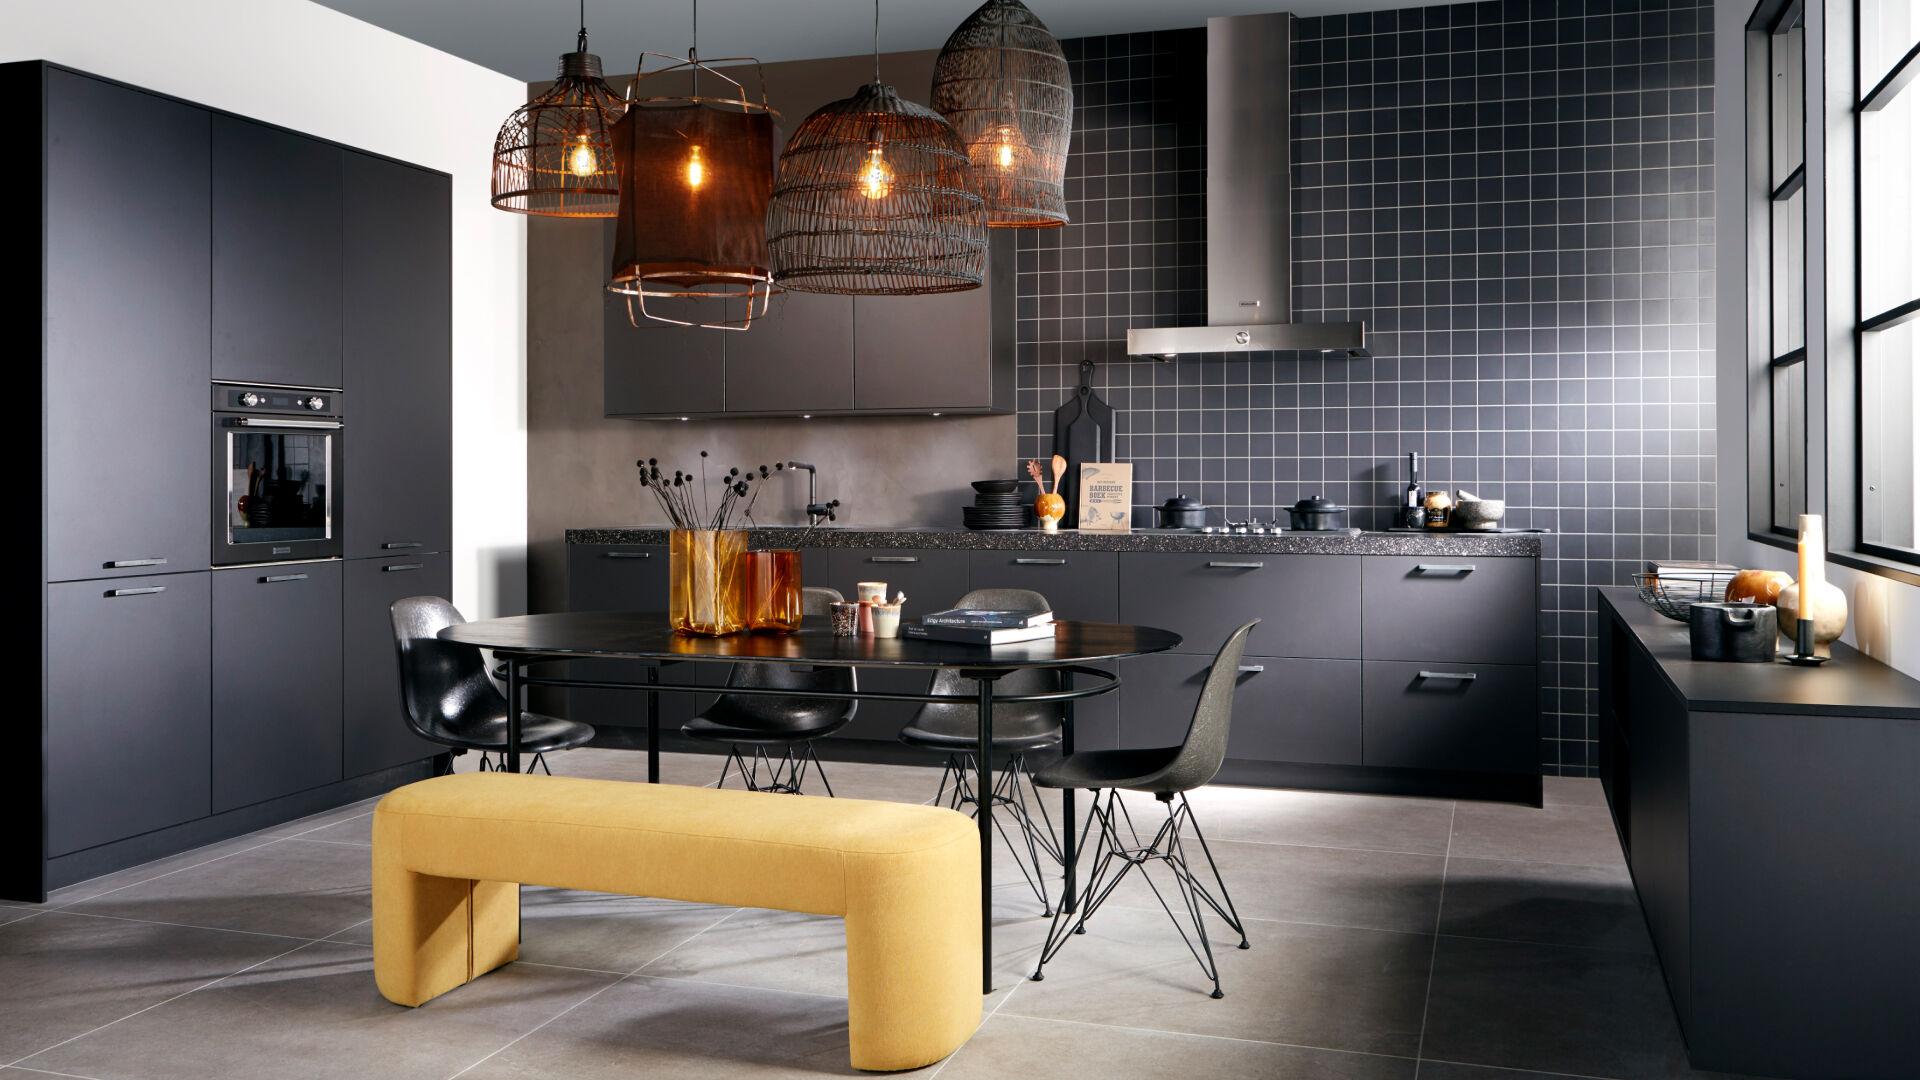 Mandemakers Keukens Het Huis Van Keukens